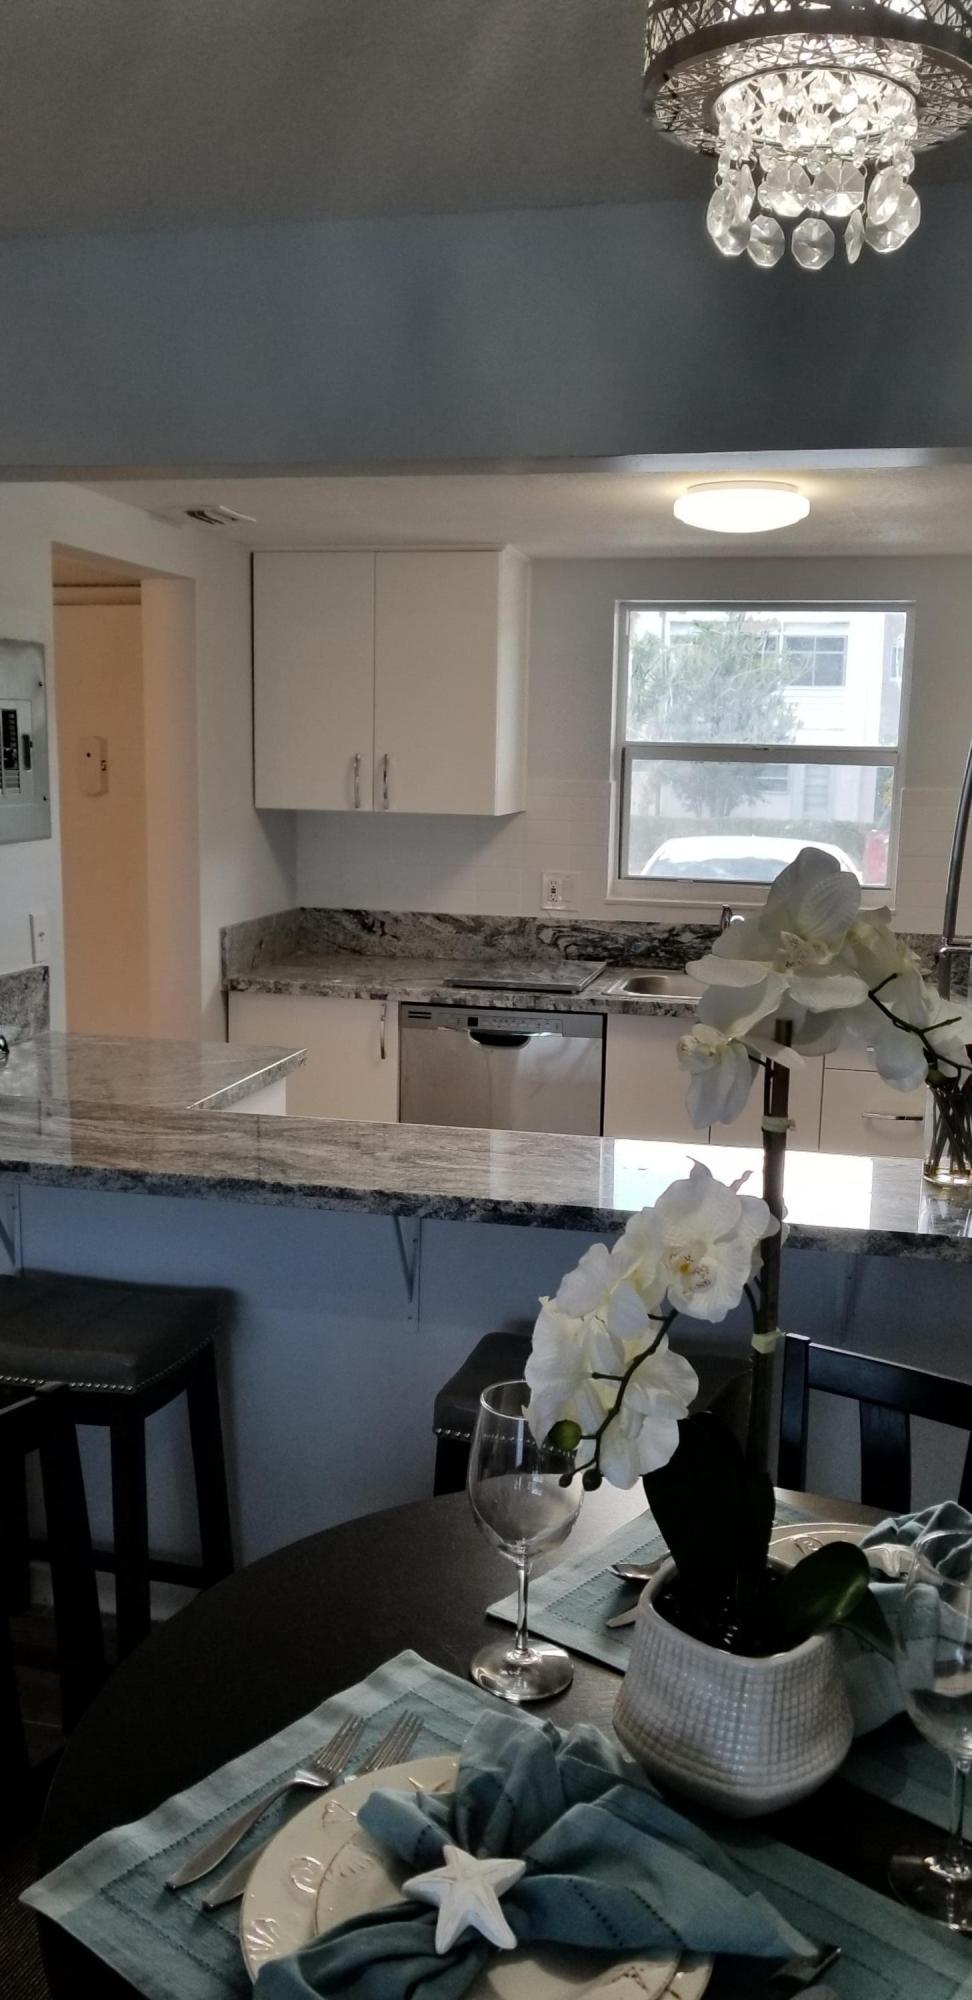 711 Lori Drive, Palm Springs, Florida 33461, 1 Bedroom Bedrooms, ,1 BathroomBathrooms,Condo/Coop,For Sale,Lakeside Village,Lori,1,RX-10481915